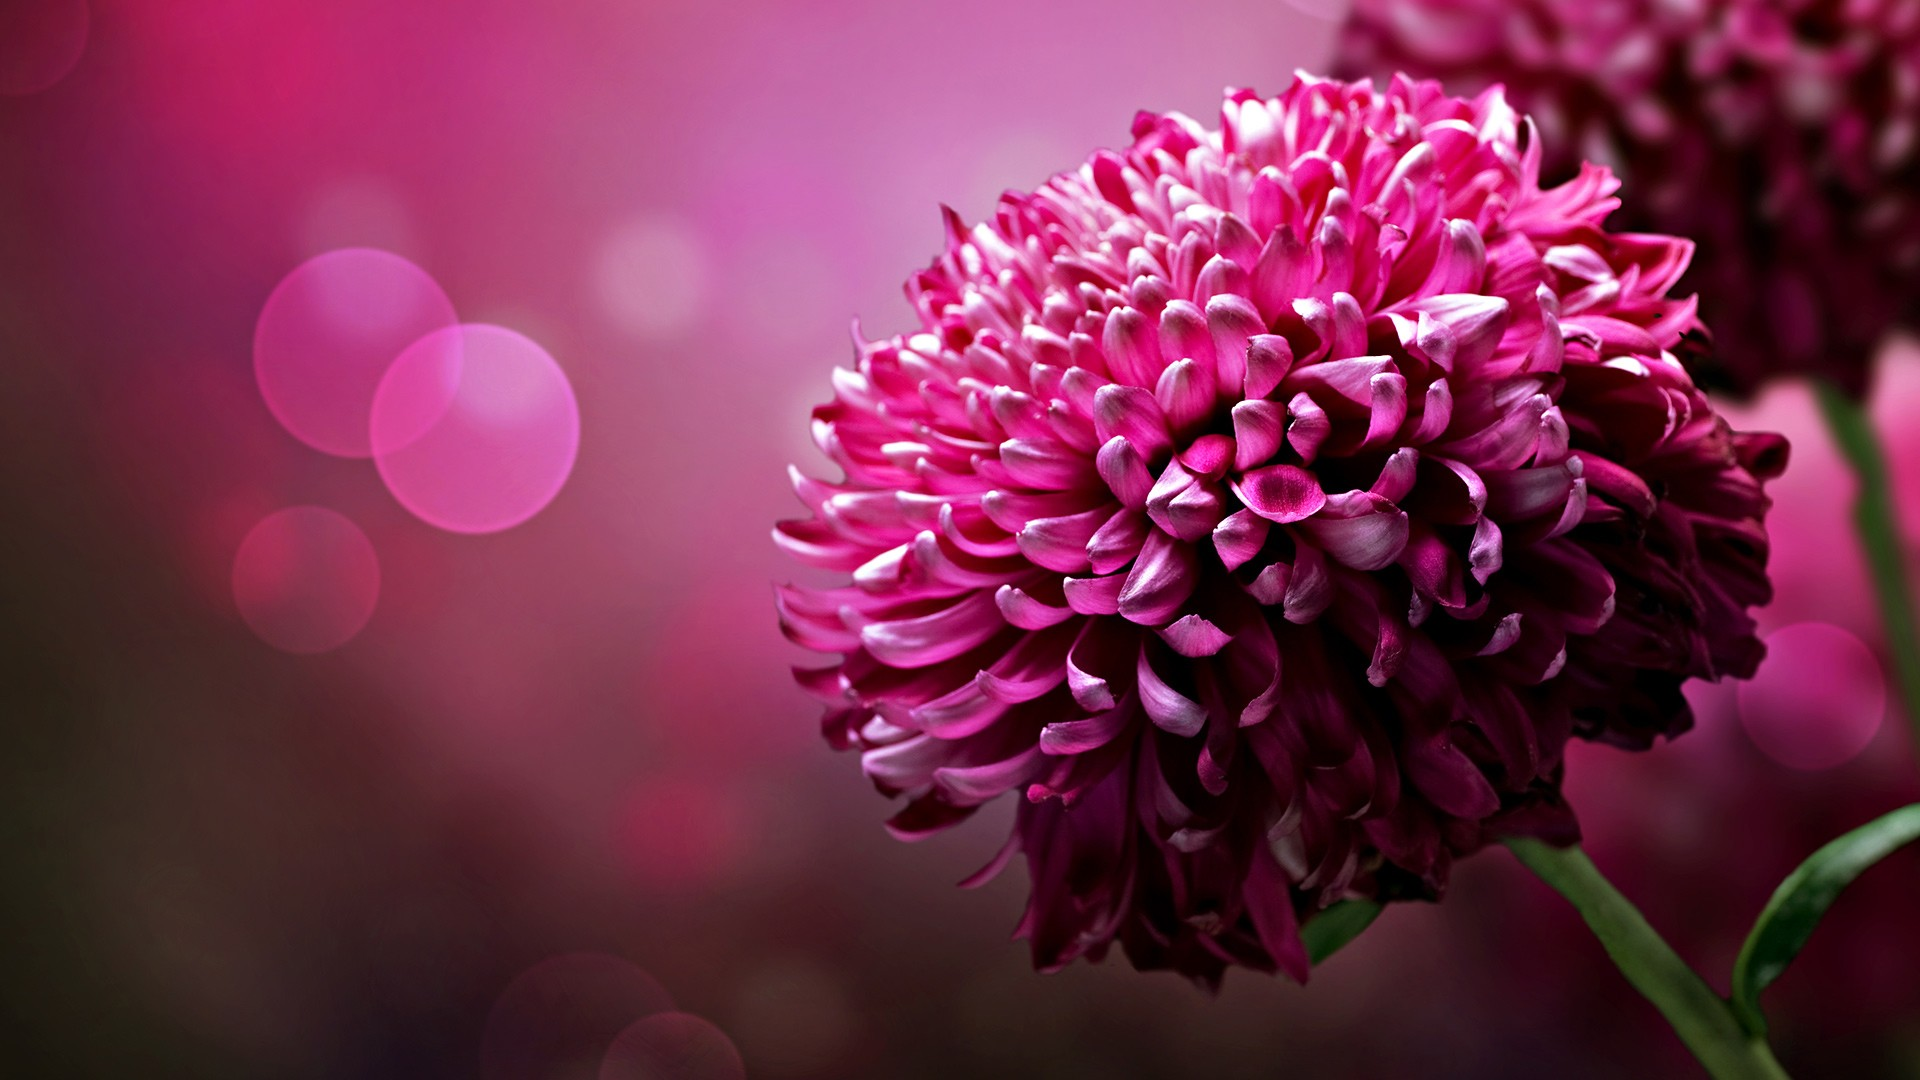 Beautiful Flowers in the World   FunAwakecom 1920x1080